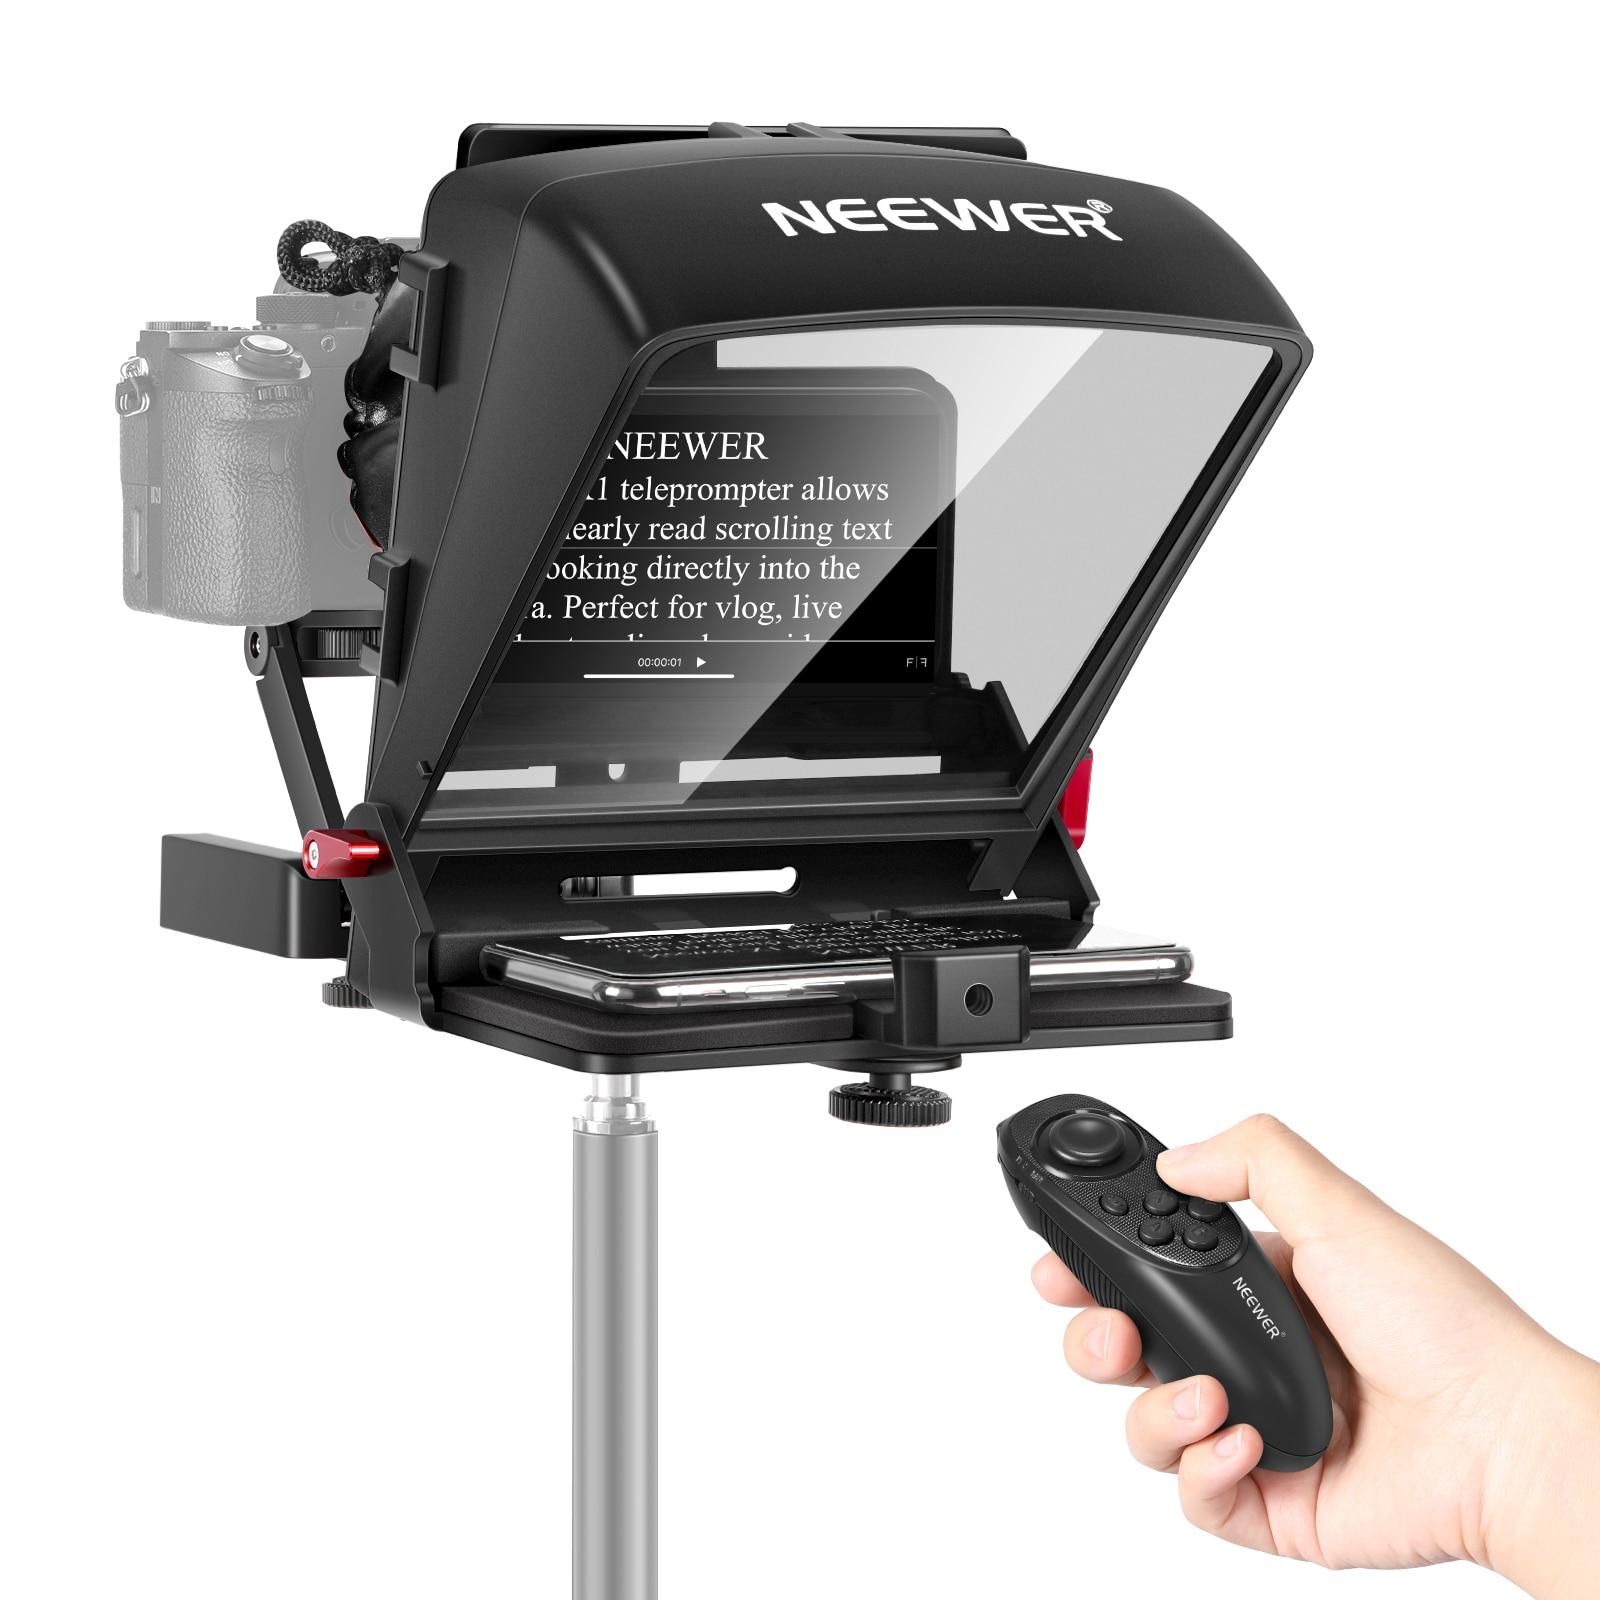 Neewer-جهاز تحكم عن بعد صغير للهاتف الذكي ، جهاز تحكم عن بعد للفيديو ، جهاز تحكم عن بعد لهاتف iPhone ، Samsung ، تسجيل الكاميرا بدون مرآة